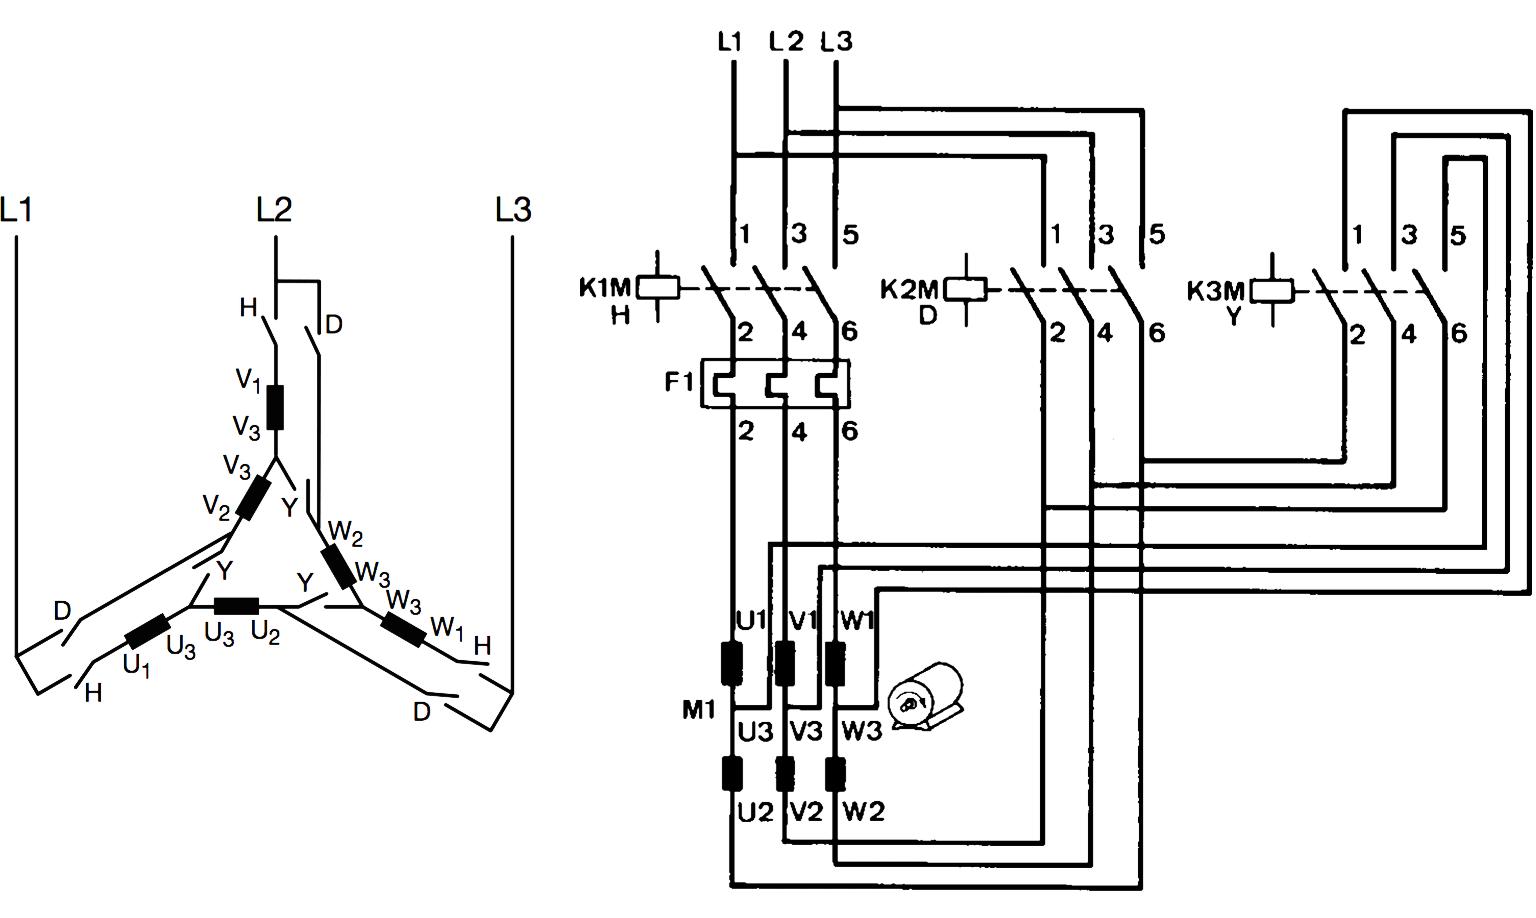 Aermacchi X90 Wiring Diagram For